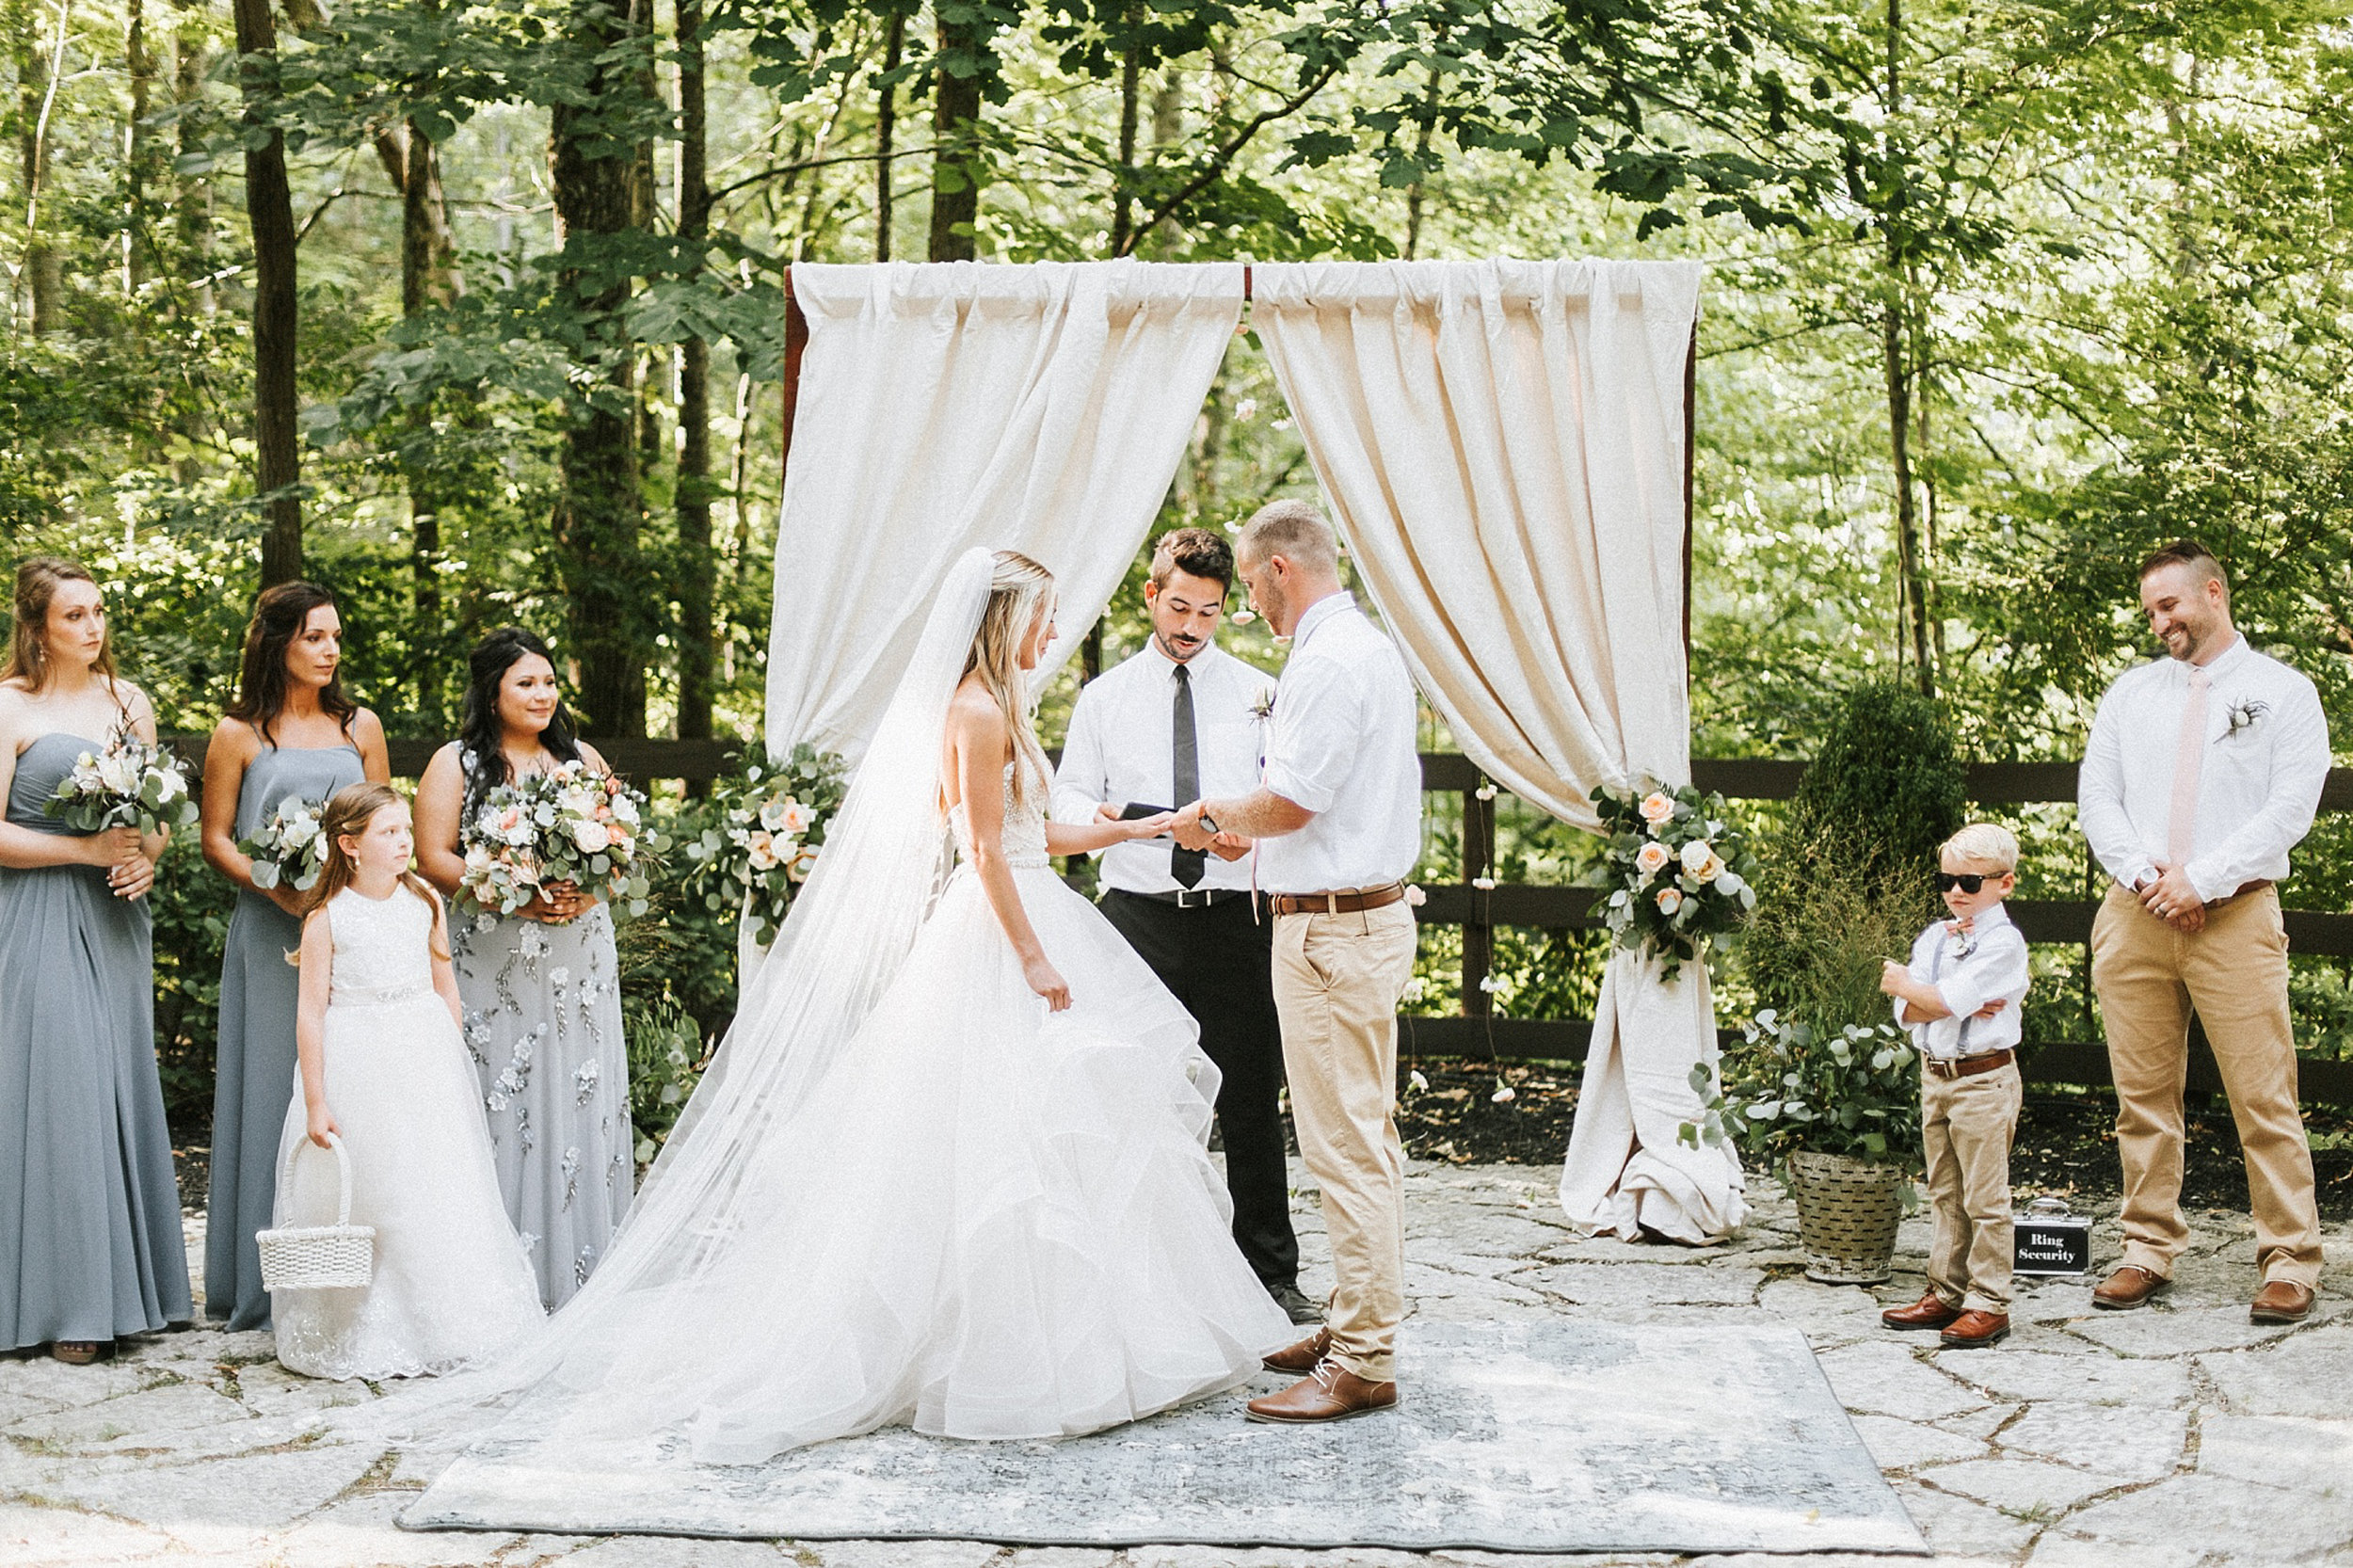 Brooke Townsend Photography - Cincinnati Wedding Photographer (79 of 153).jpg